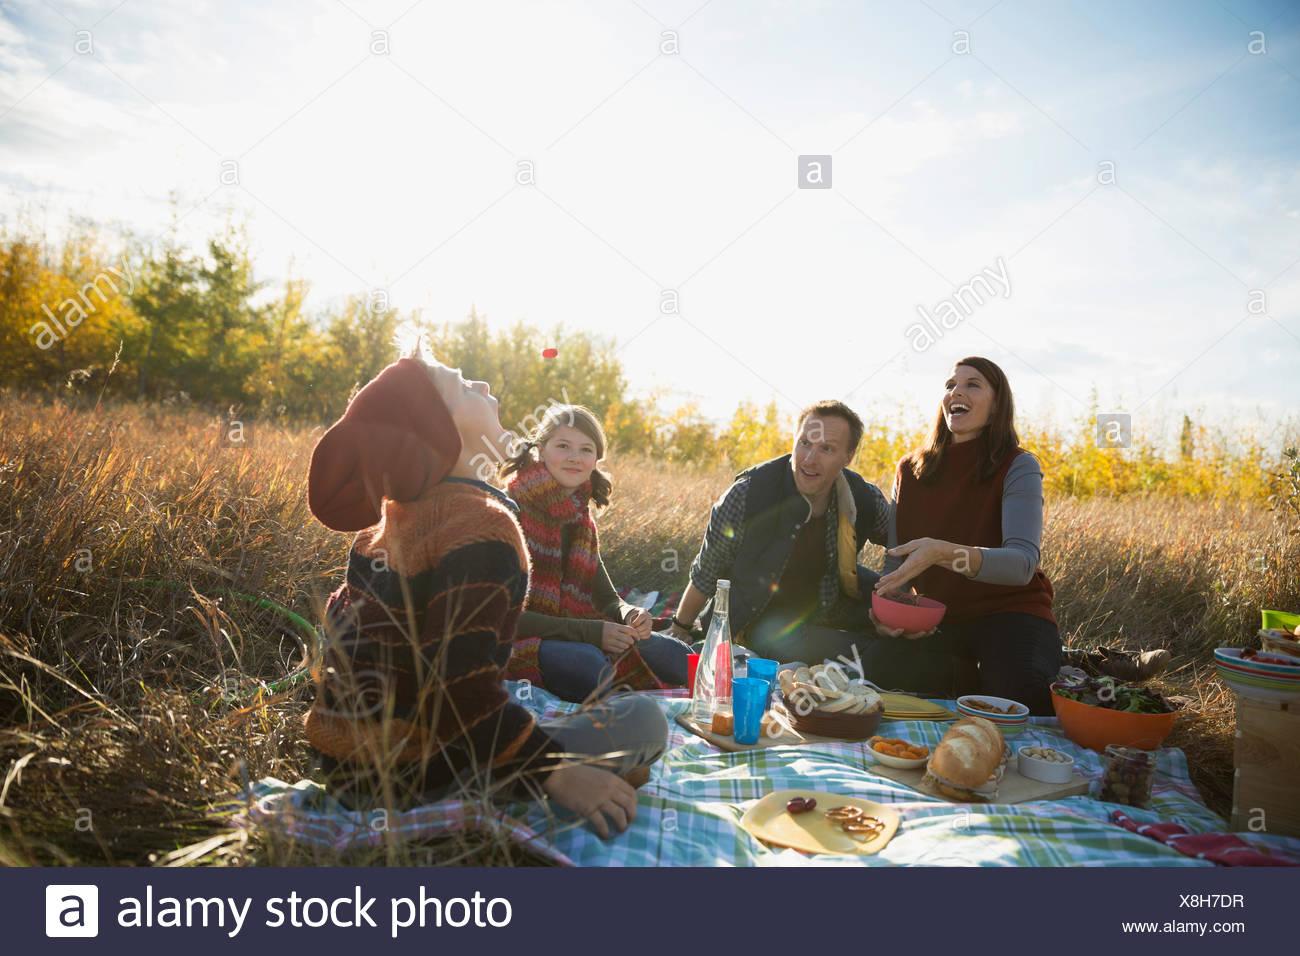 Family enjoying picnic in sunny autumn field - Stock Image